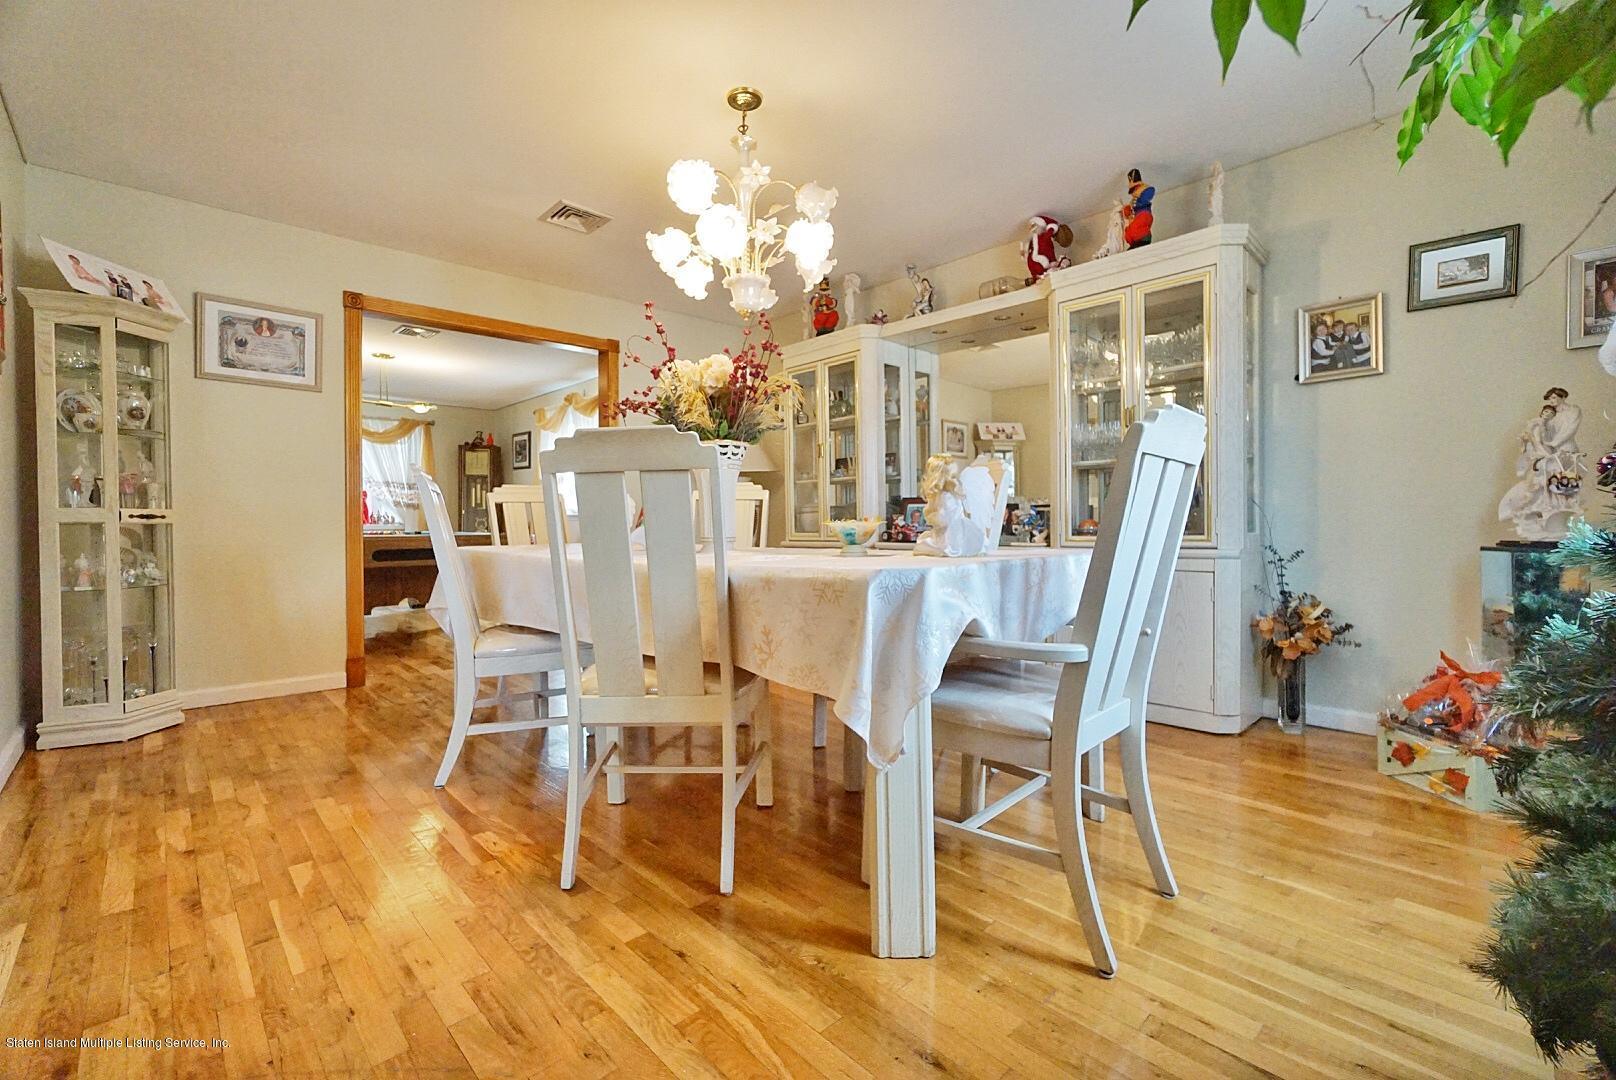 Two Family - Detached 360 Main Street  Staten Island, NY 10307, MLS-1124744-7